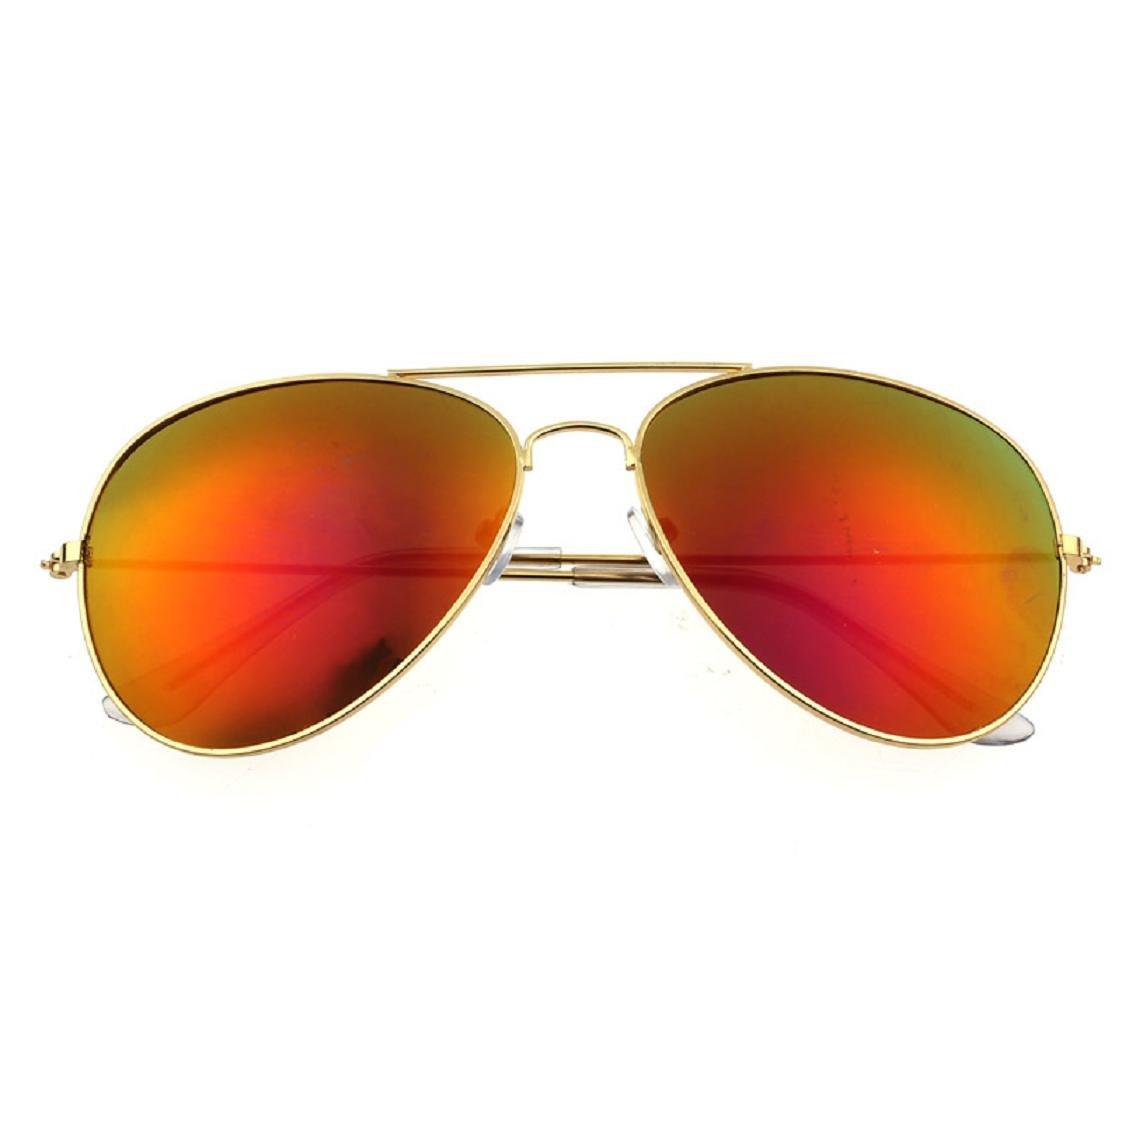 Mchoice Women Men Classic Unisex Retro Sunglasses Metal Frame Green